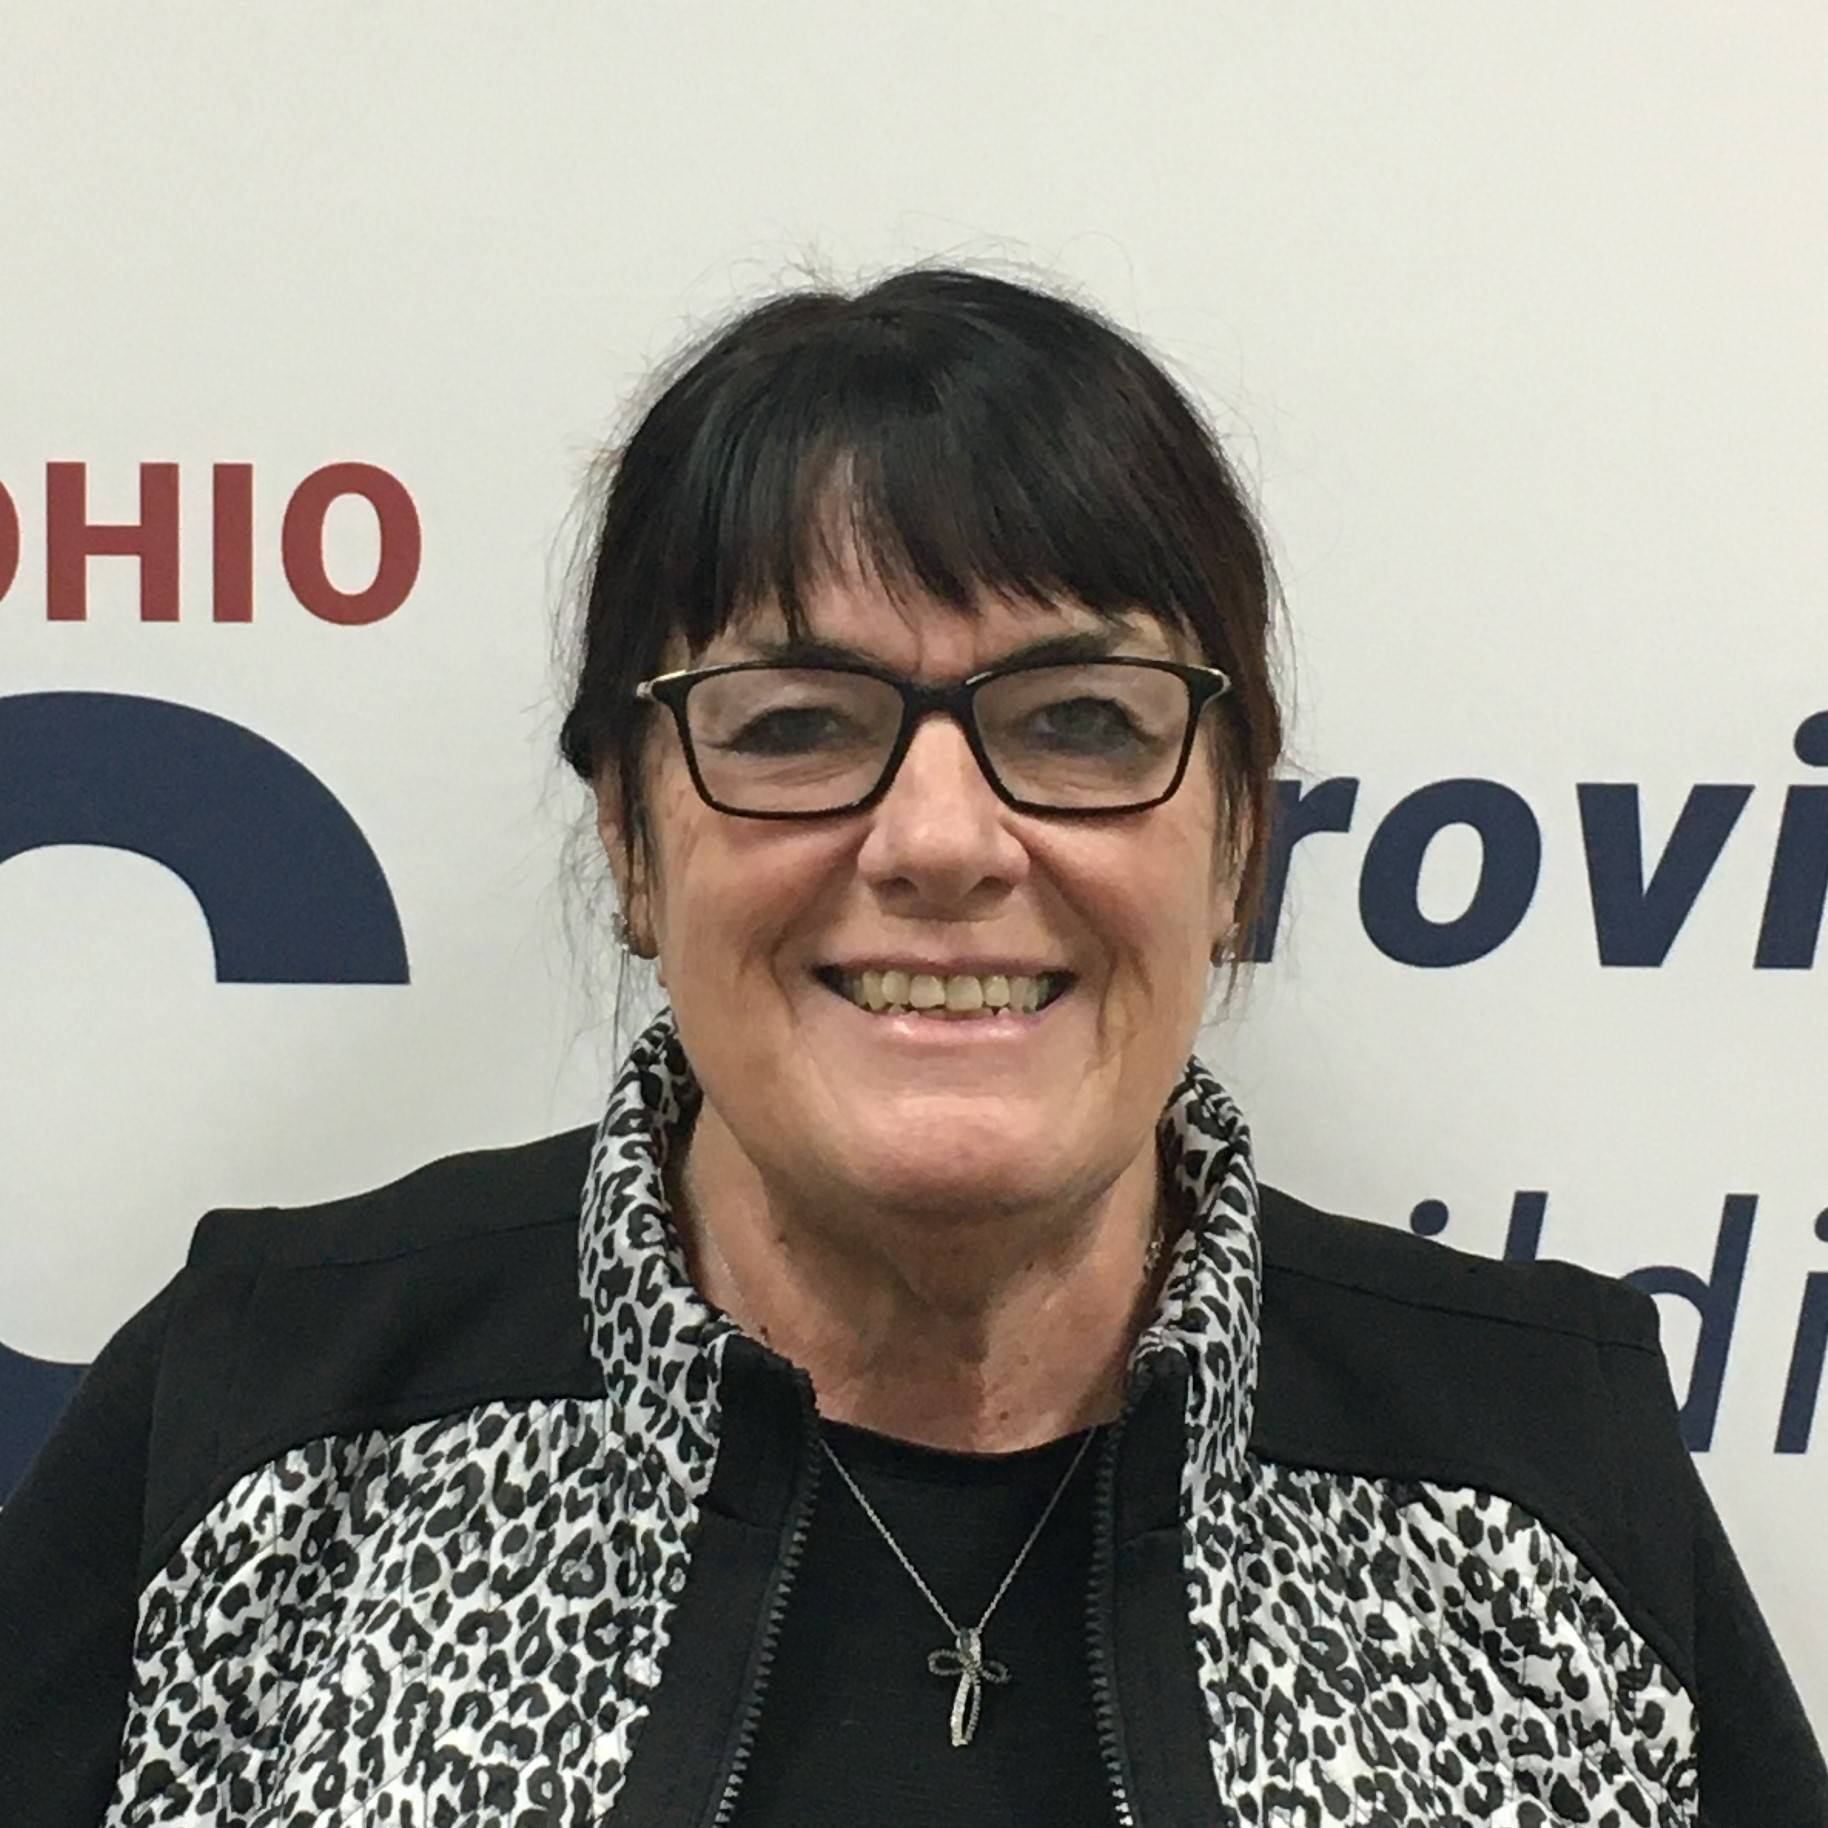 Nona Rupp, President, representing Fulton County District 1